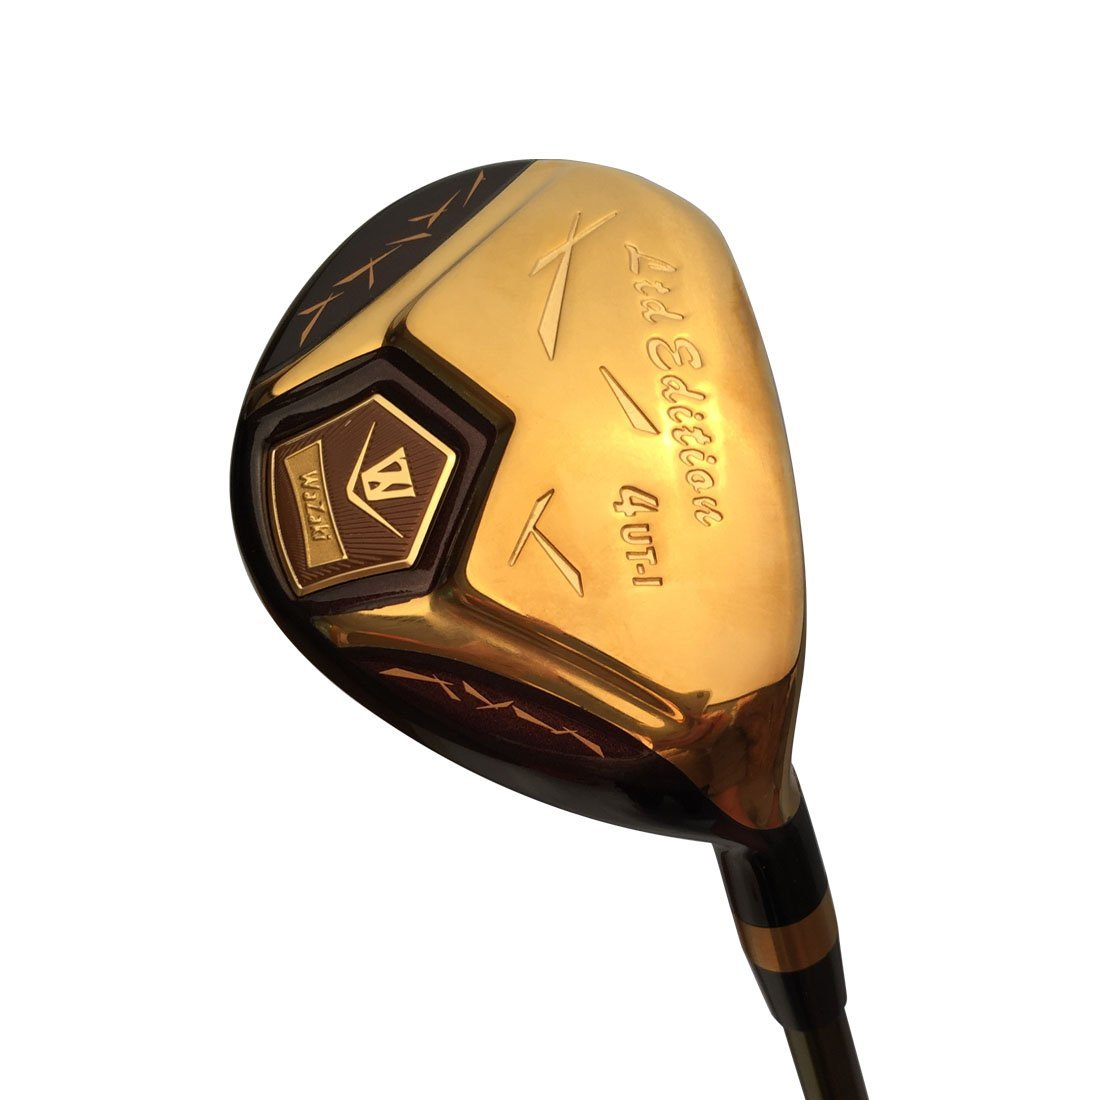 Japan WaZaki 14k Gold Finish Cyclone 4-SW Mx Steel Hybrid Irons Golf Club Set + Headcover (pack of 16) by wazaki (Image #6)